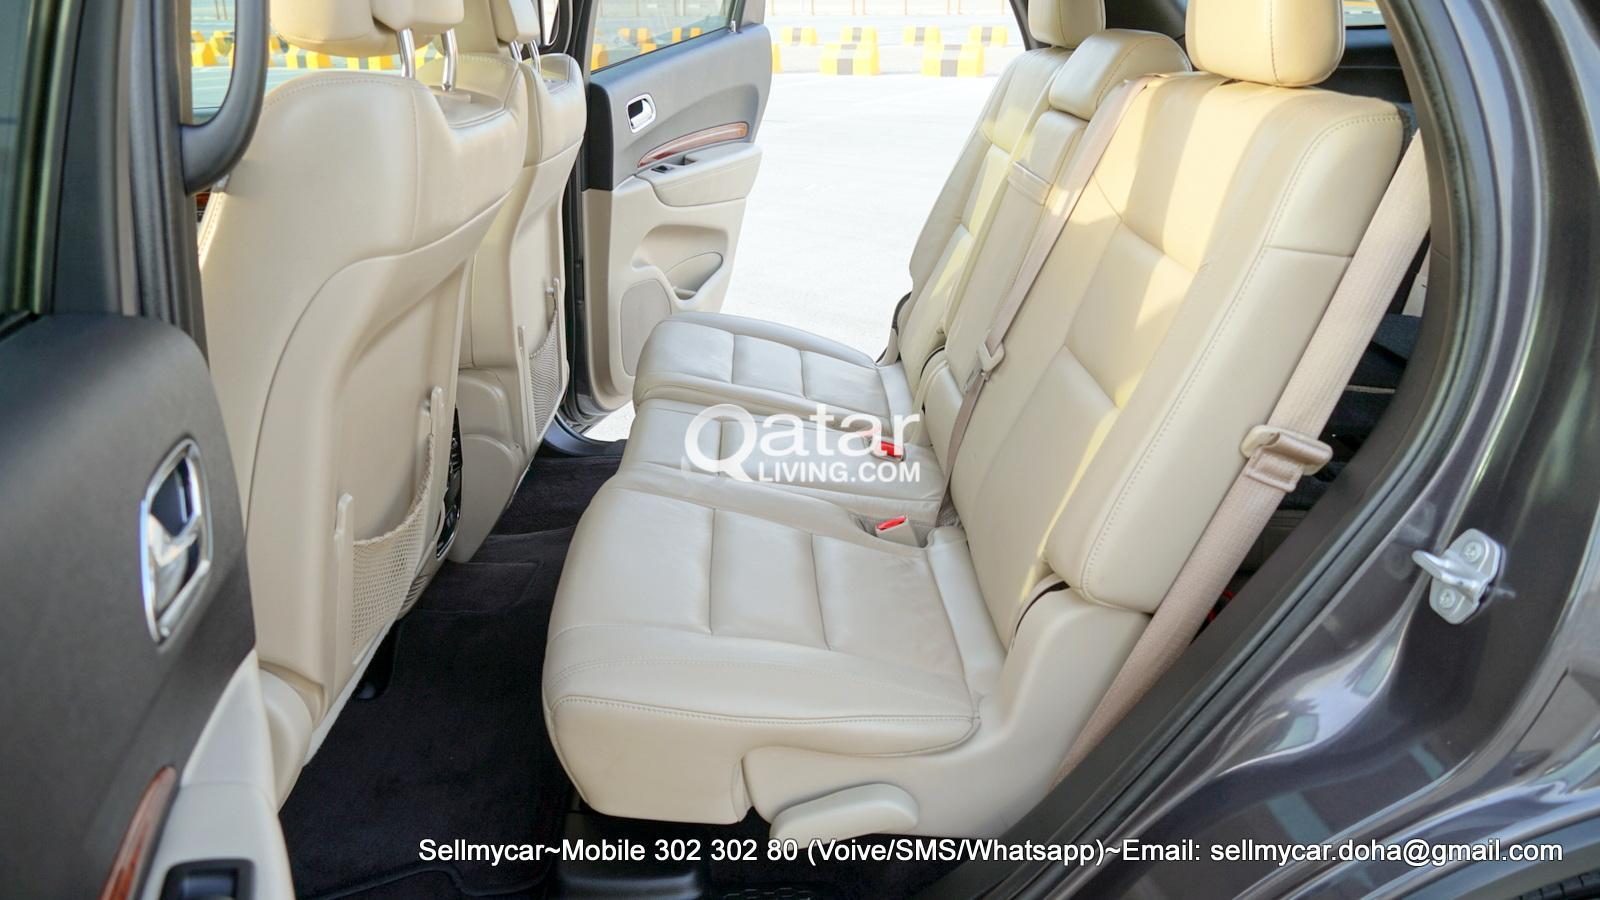 2016 Dodge Durango Limited V6 (7-Seater) More Phot